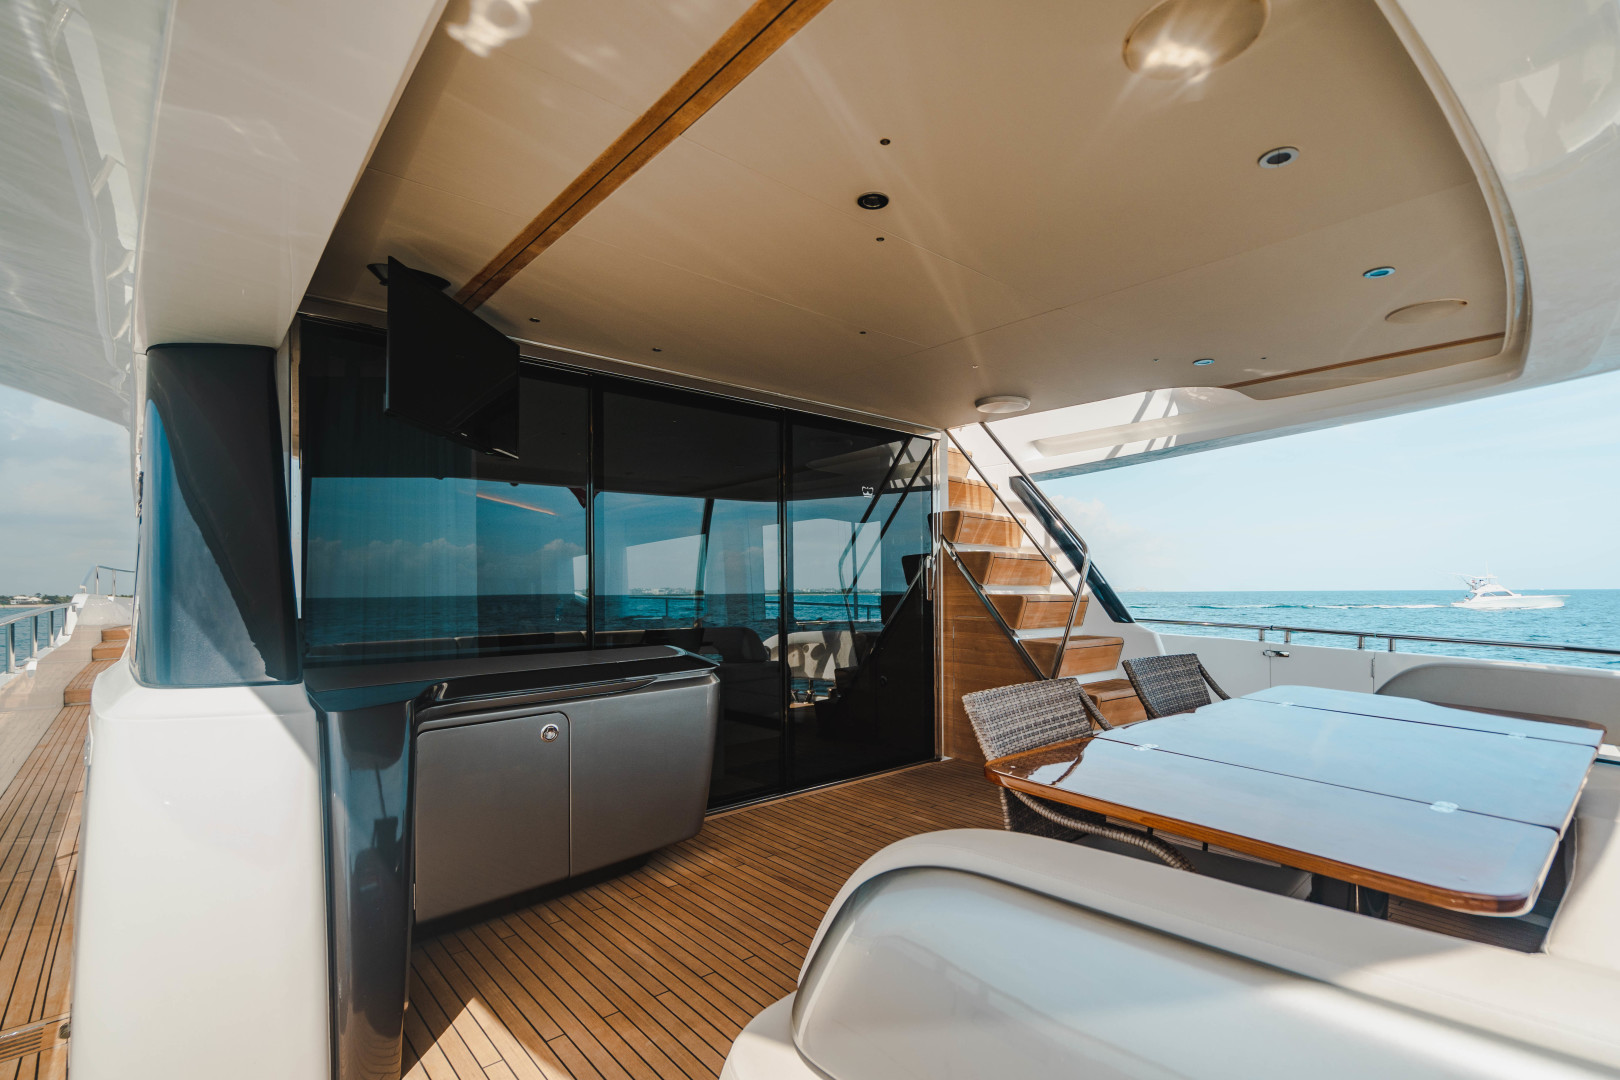 Princess-Y85  2019-Splash Delray Beach-Florida-United States-1631615 | Thumbnail